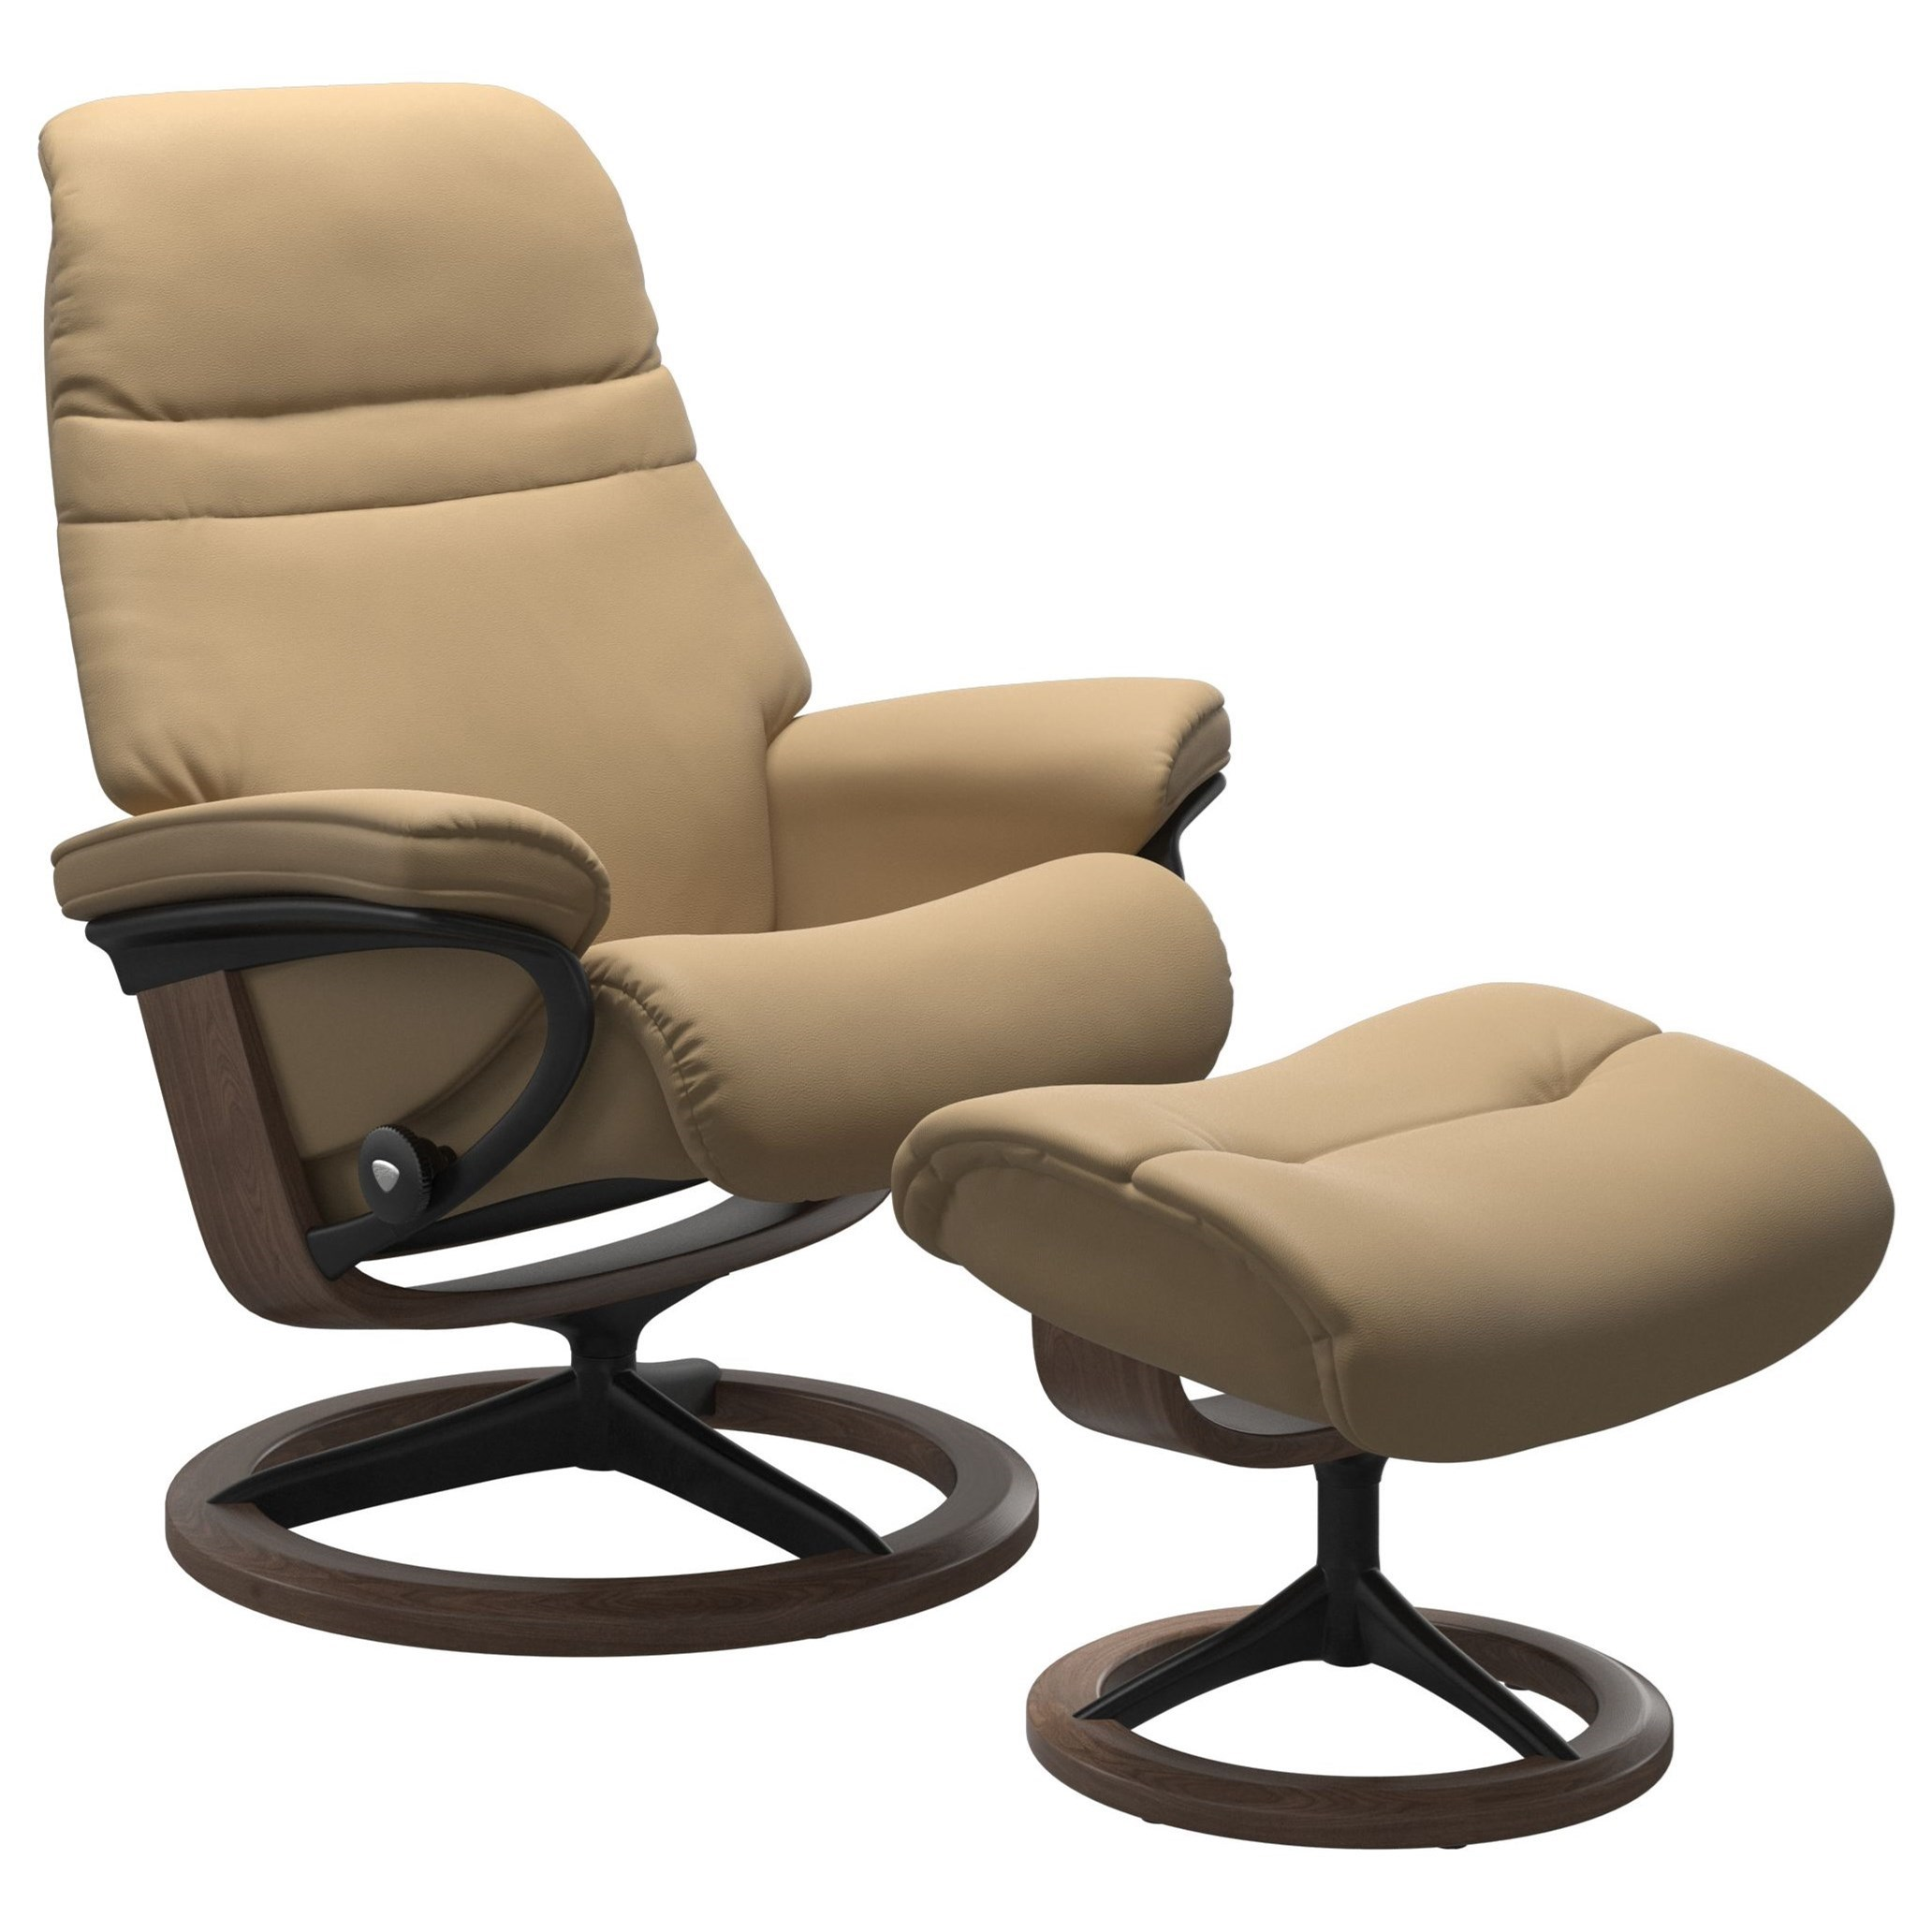 Sunrise Medium Reclining Chair and Ottoman by Stressless at HomeWorld Furniture